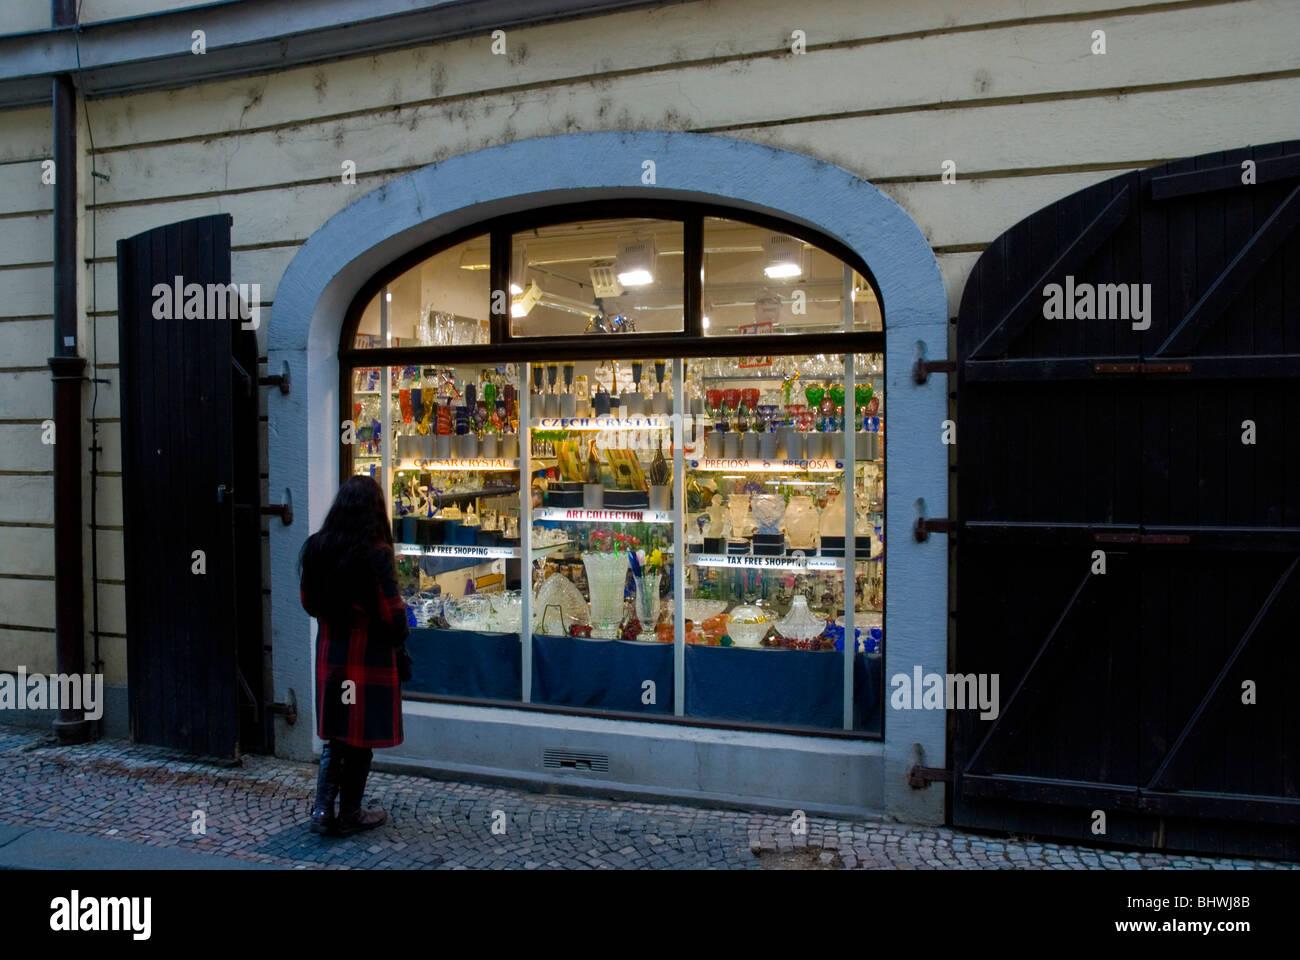 Tienda de cristalería Josefska, calle central de Mala Strana de Praga República Checa Europa Imagen De Stock